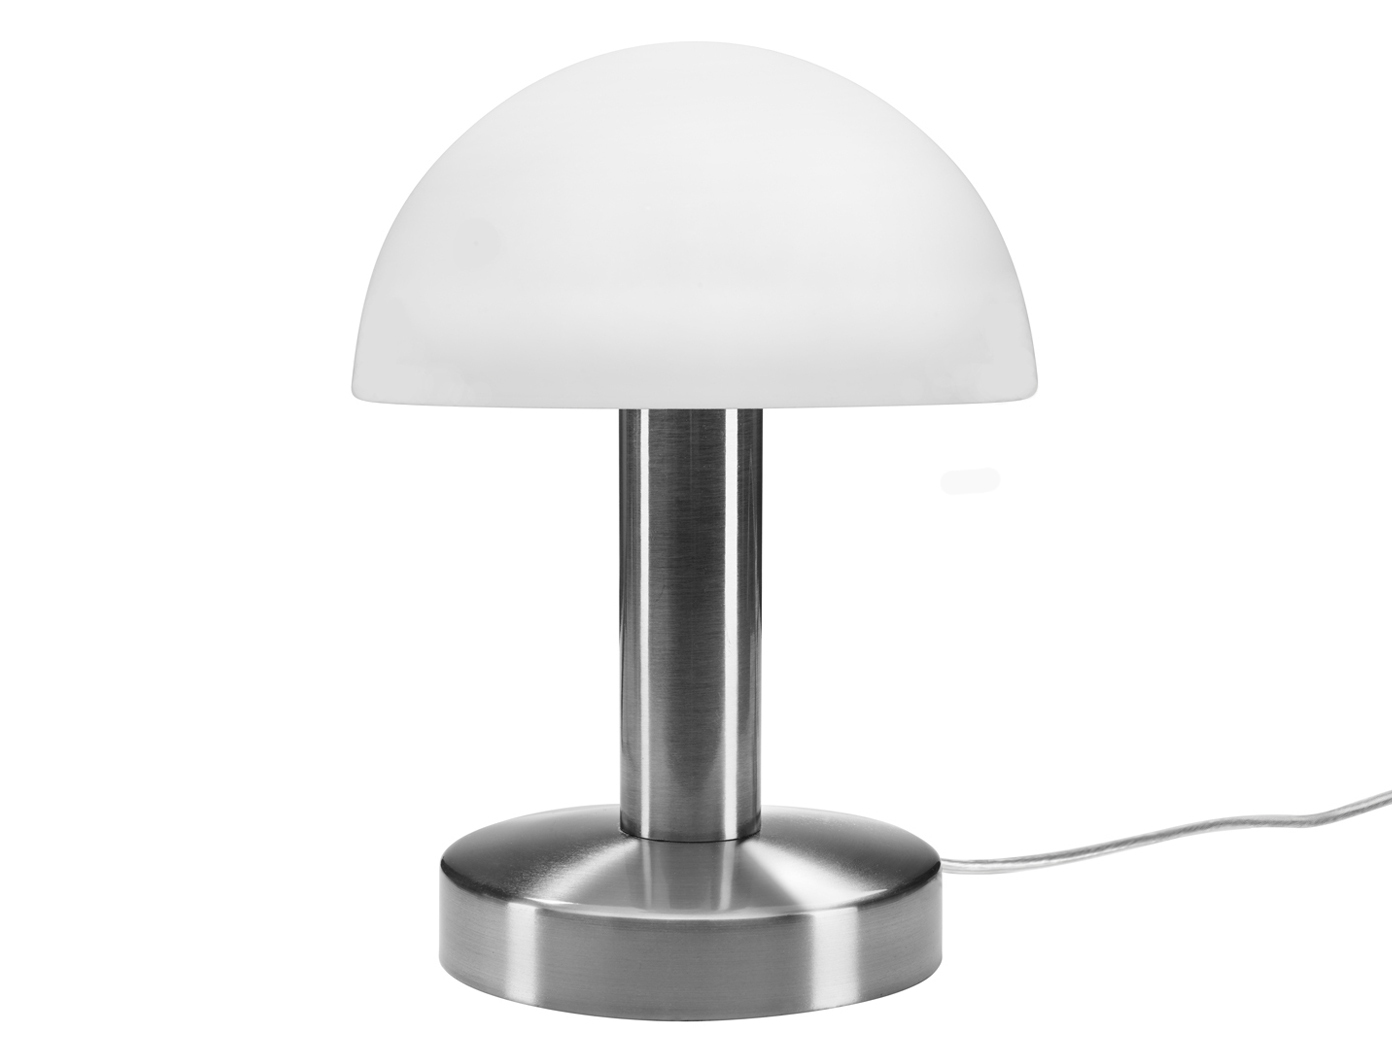 nachttischlampe touch dimmbar lampe nachttisch genial. Black Bedroom Furniture Sets. Home Design Ideas